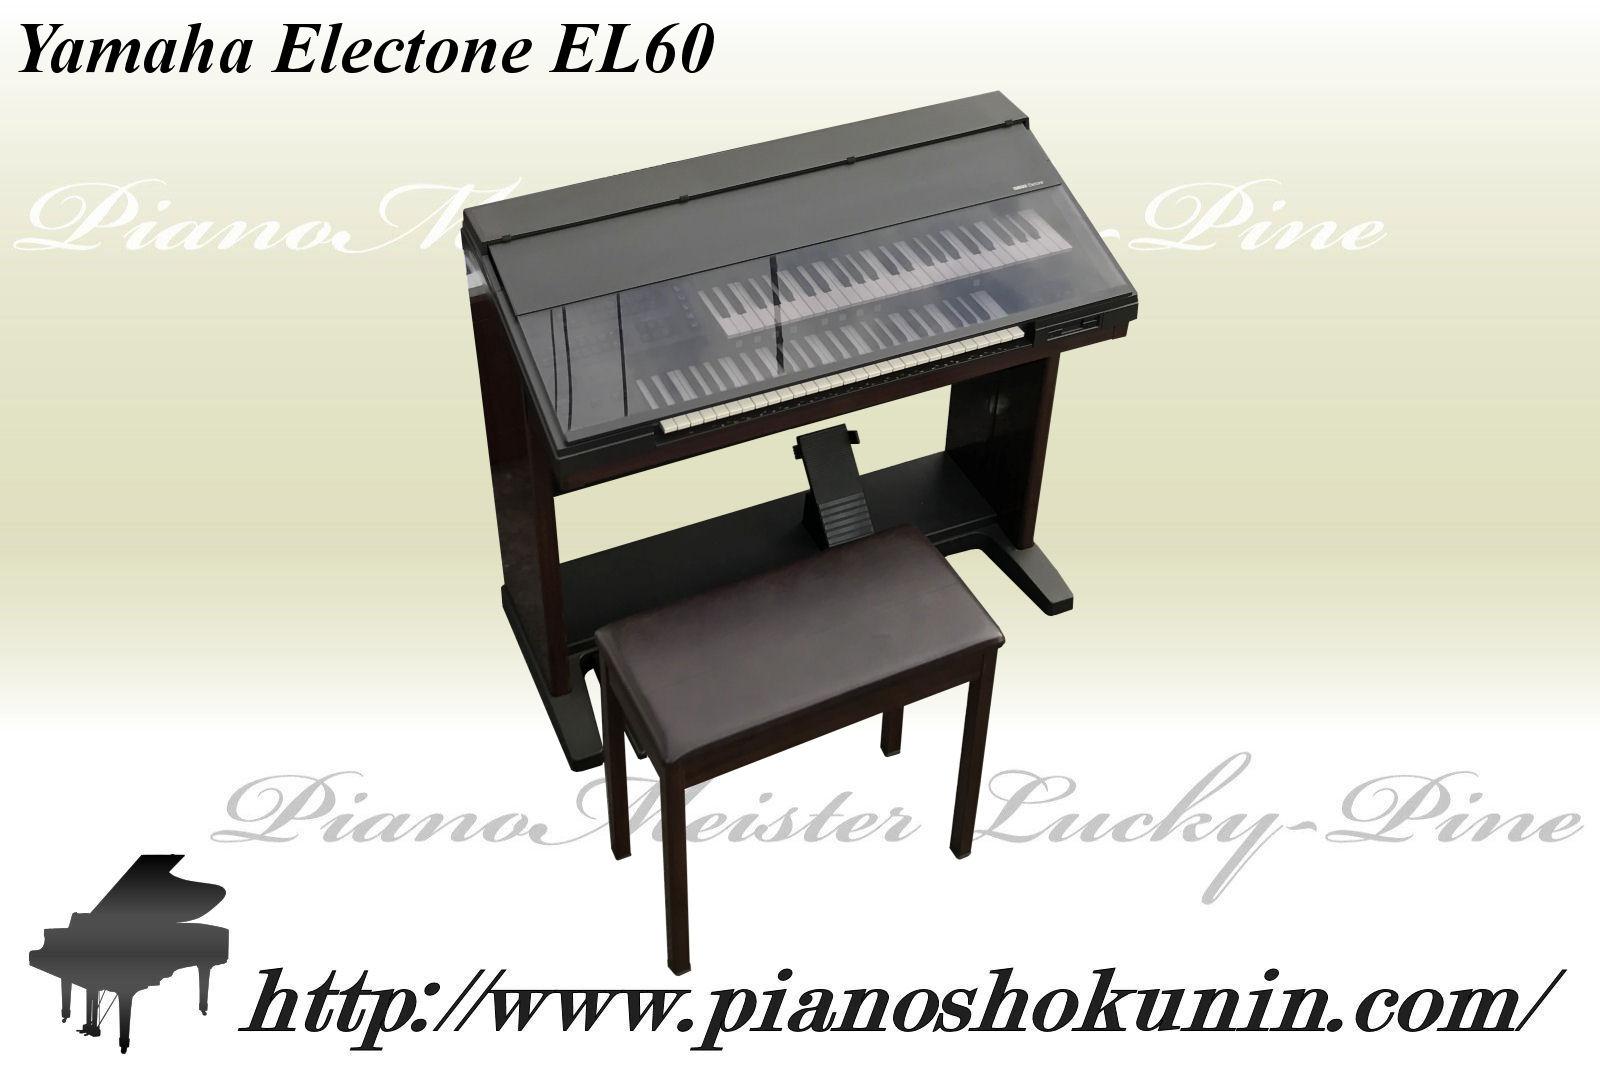 Yamaha Electone EL60